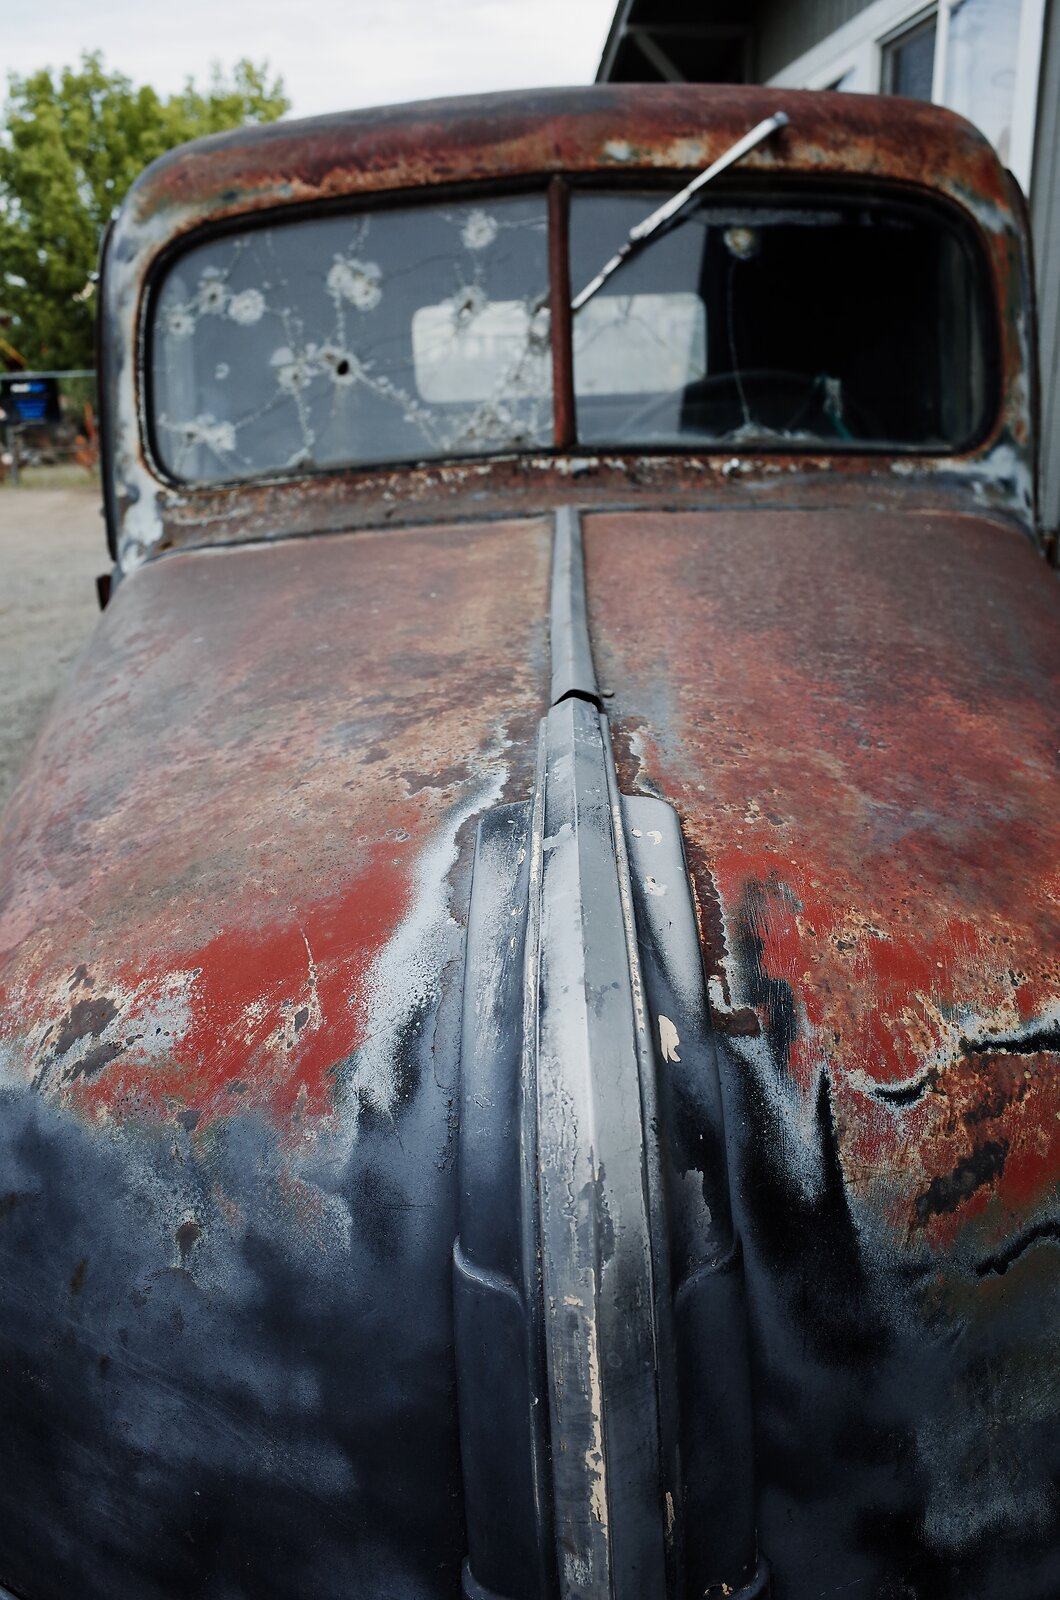 GRII_May5_Ancient_Ford_pickup#4.jpg